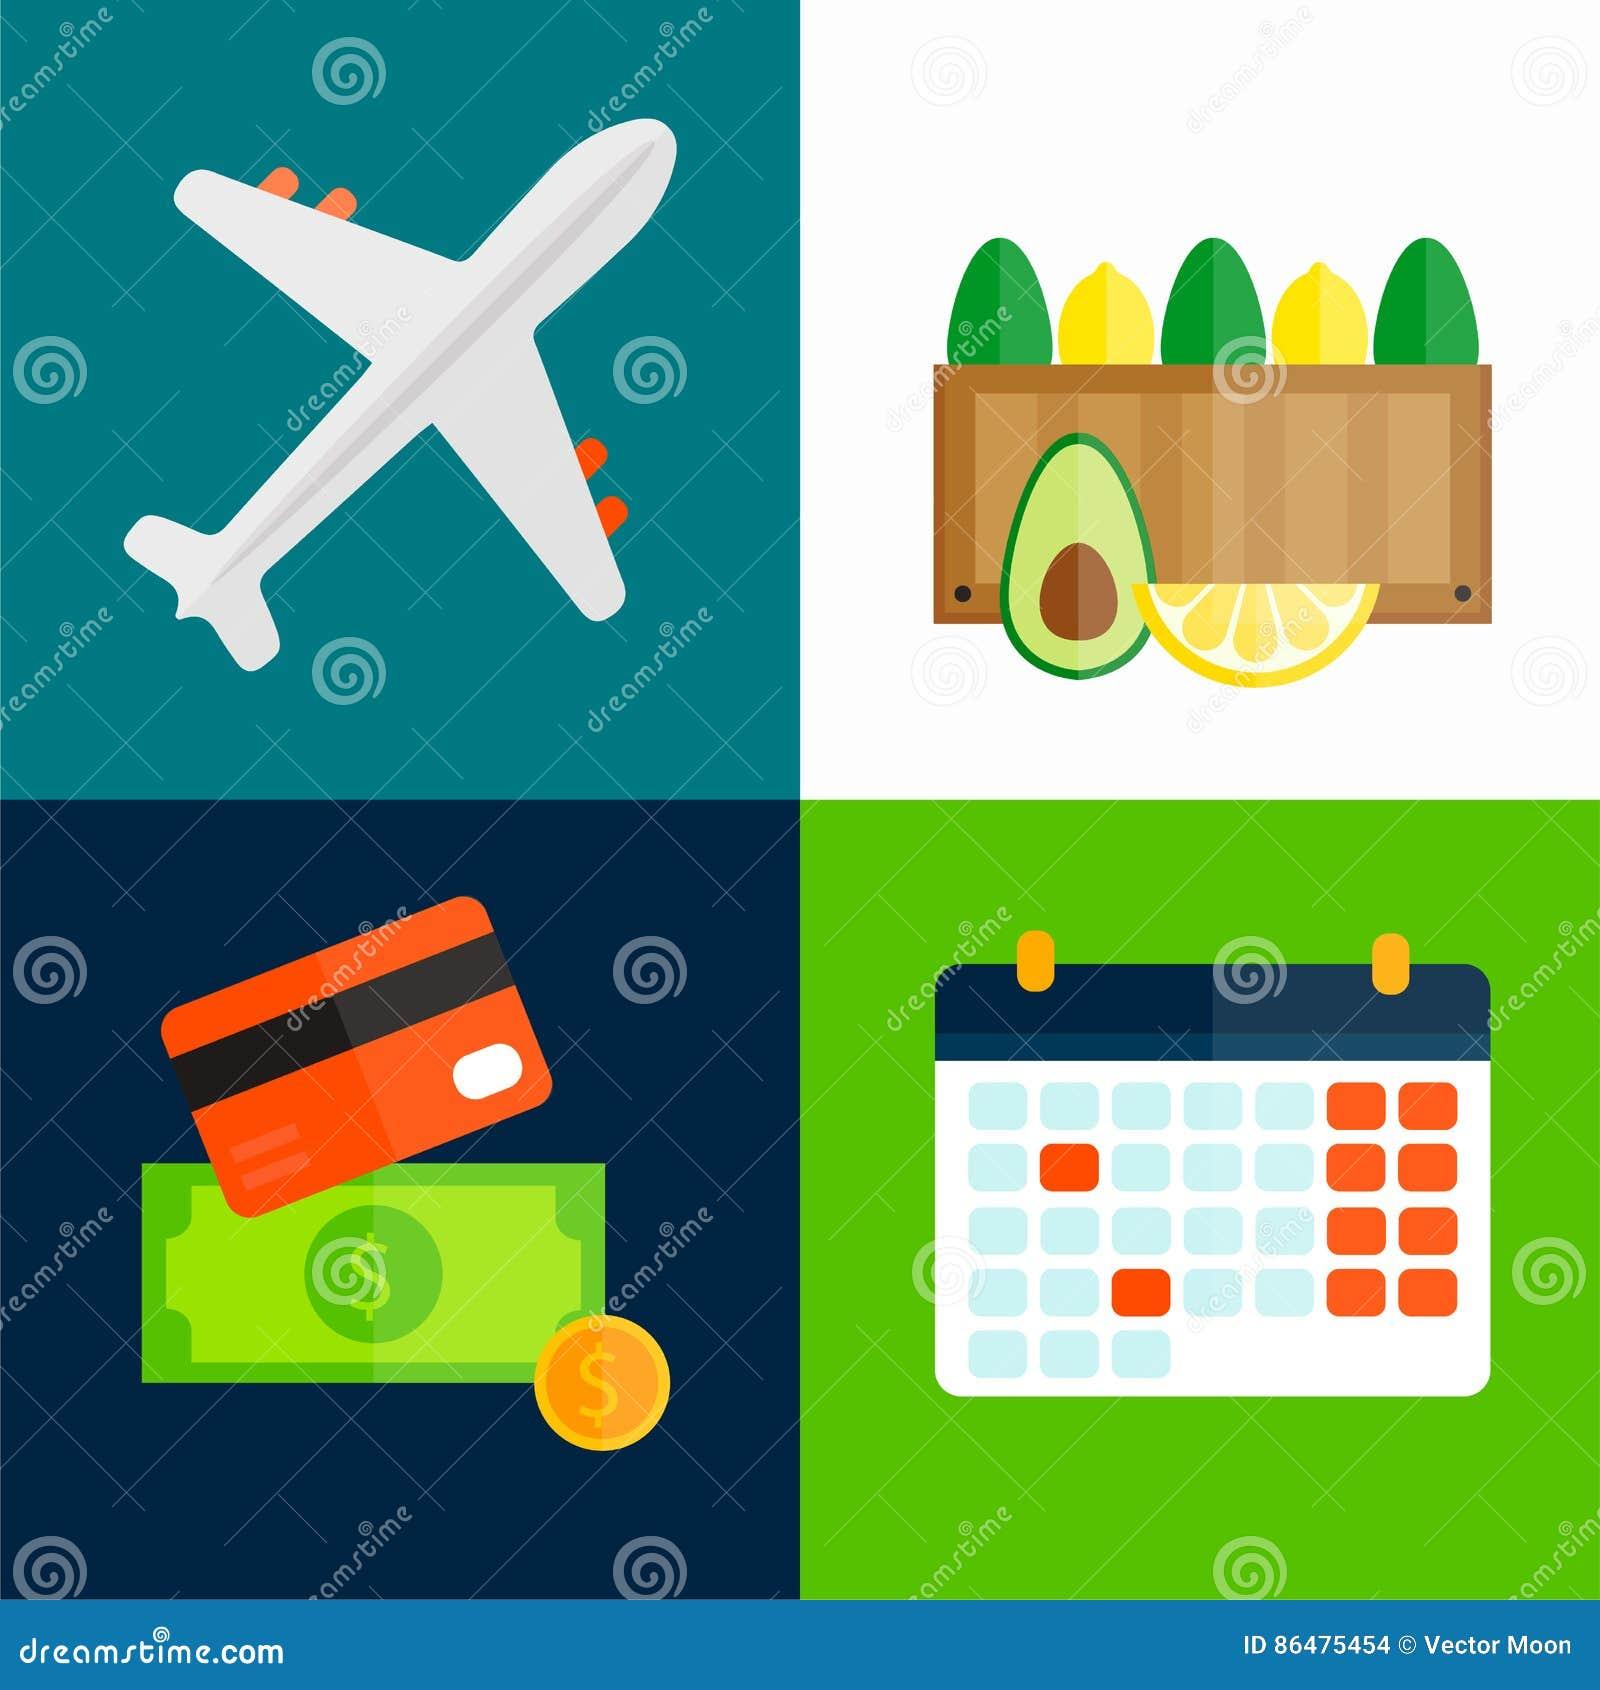 Import export fruits airplane transport vector illustration.